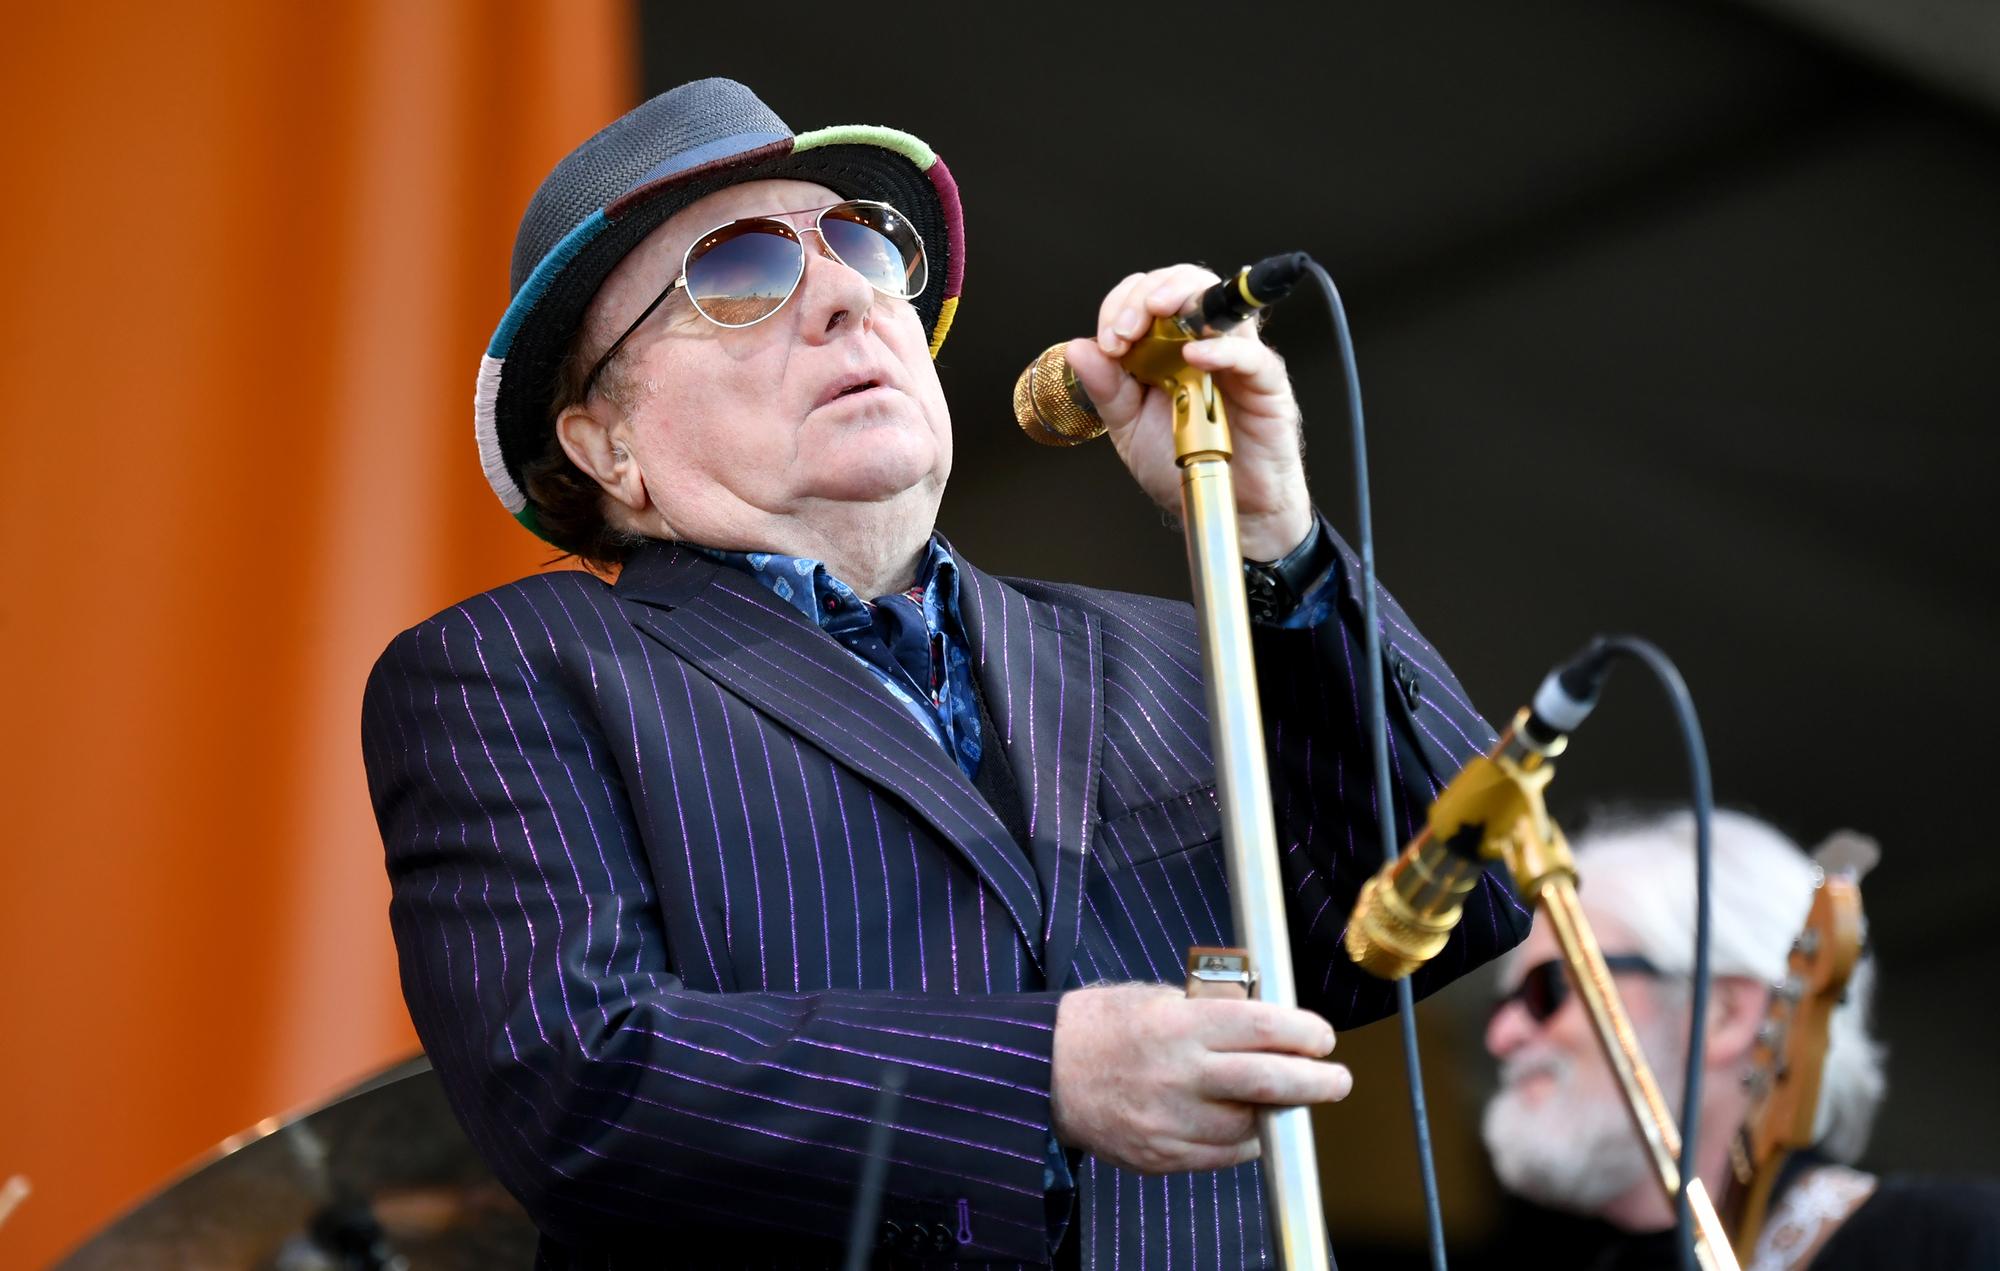 Van Morrison Tour 2020 Van Morrison announces string of UK shows for 2019 and 2020